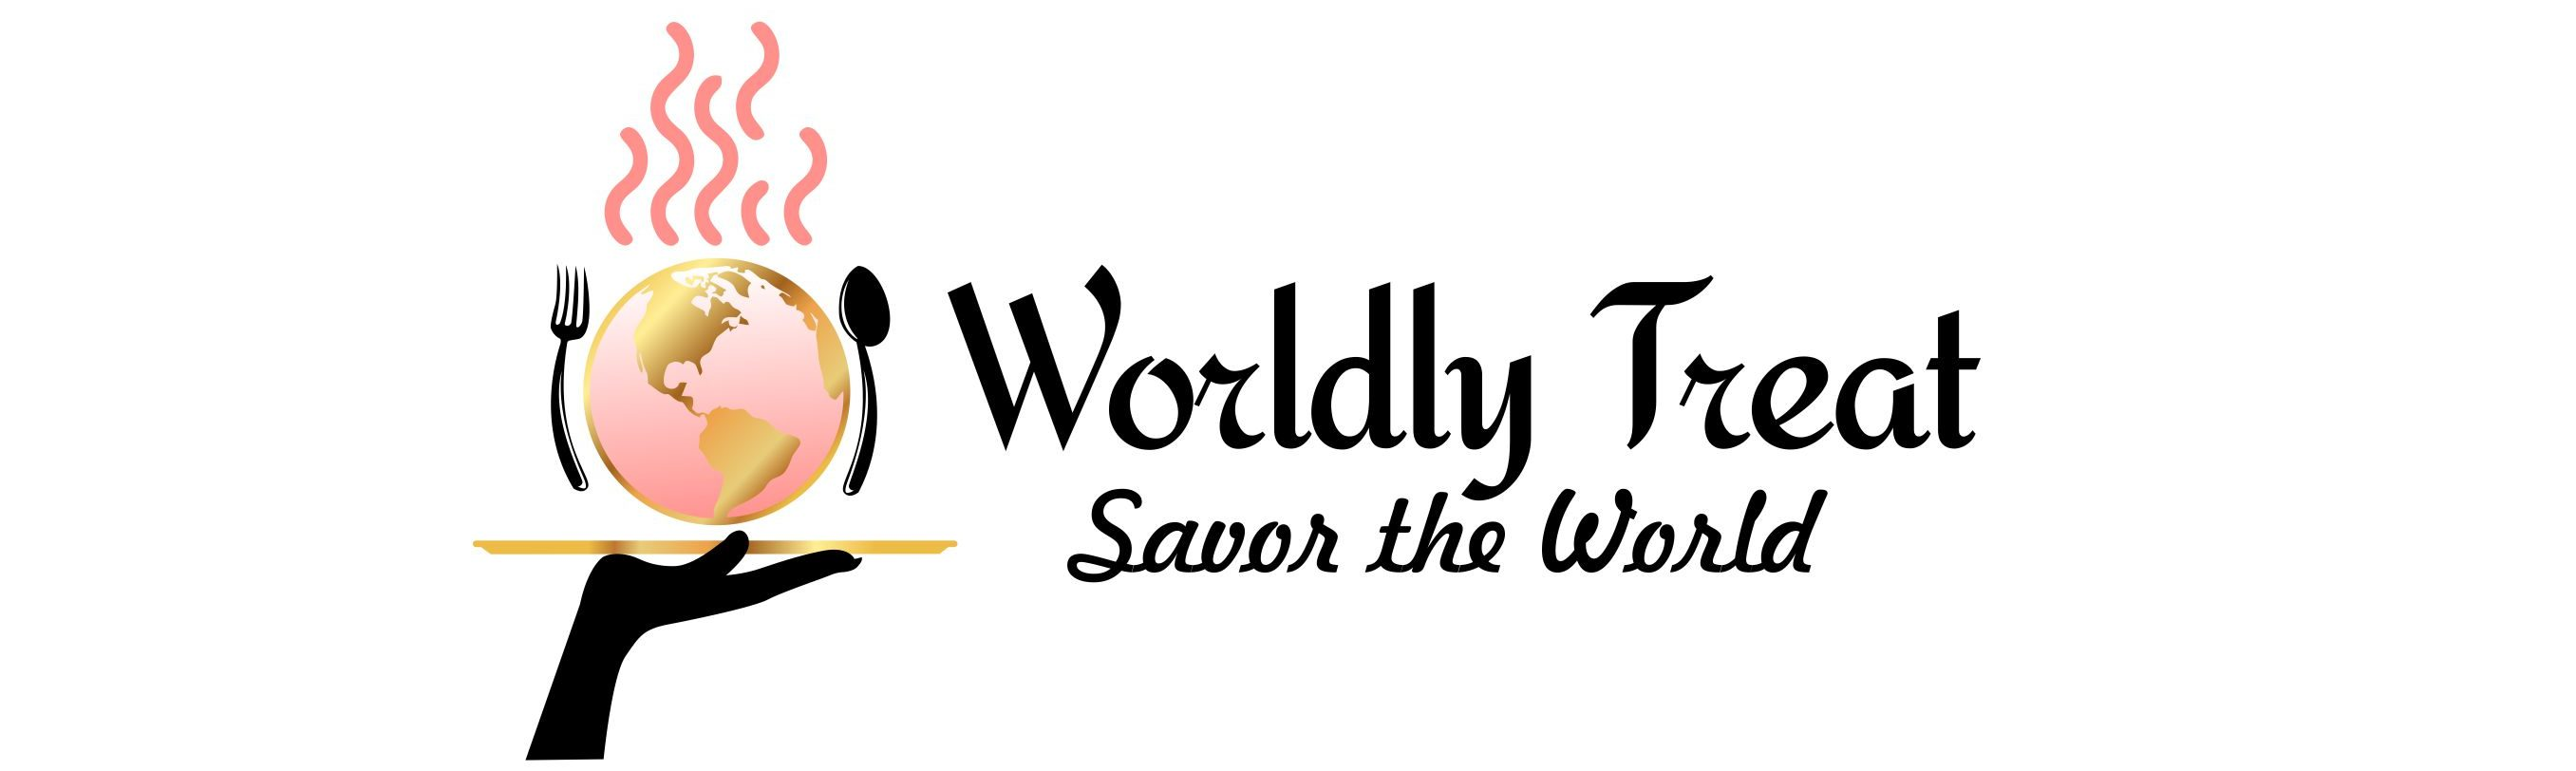 WORLDLY TREAT